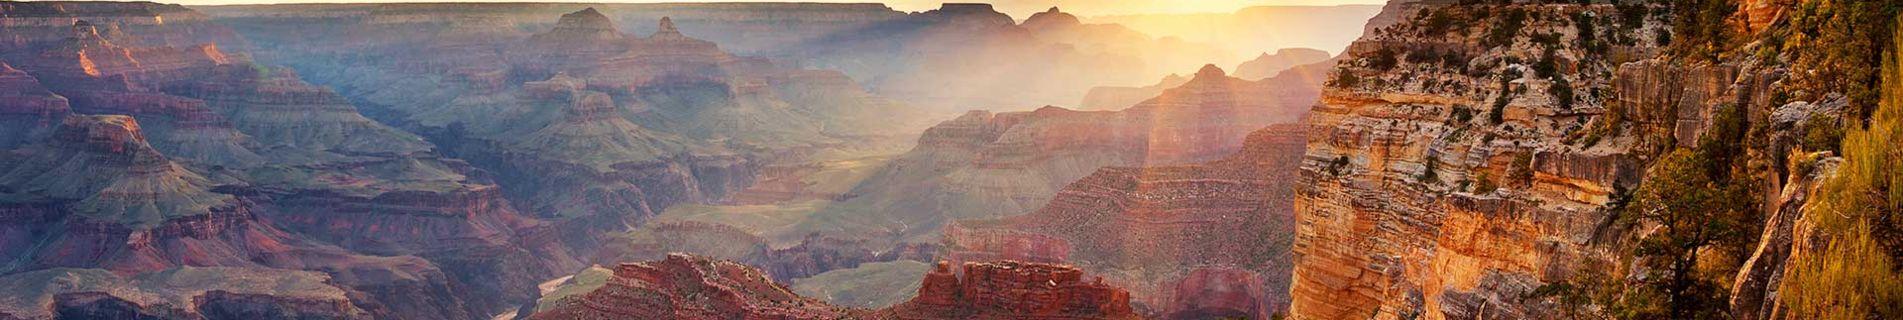 South Rim of Grand Canyon at Sunset